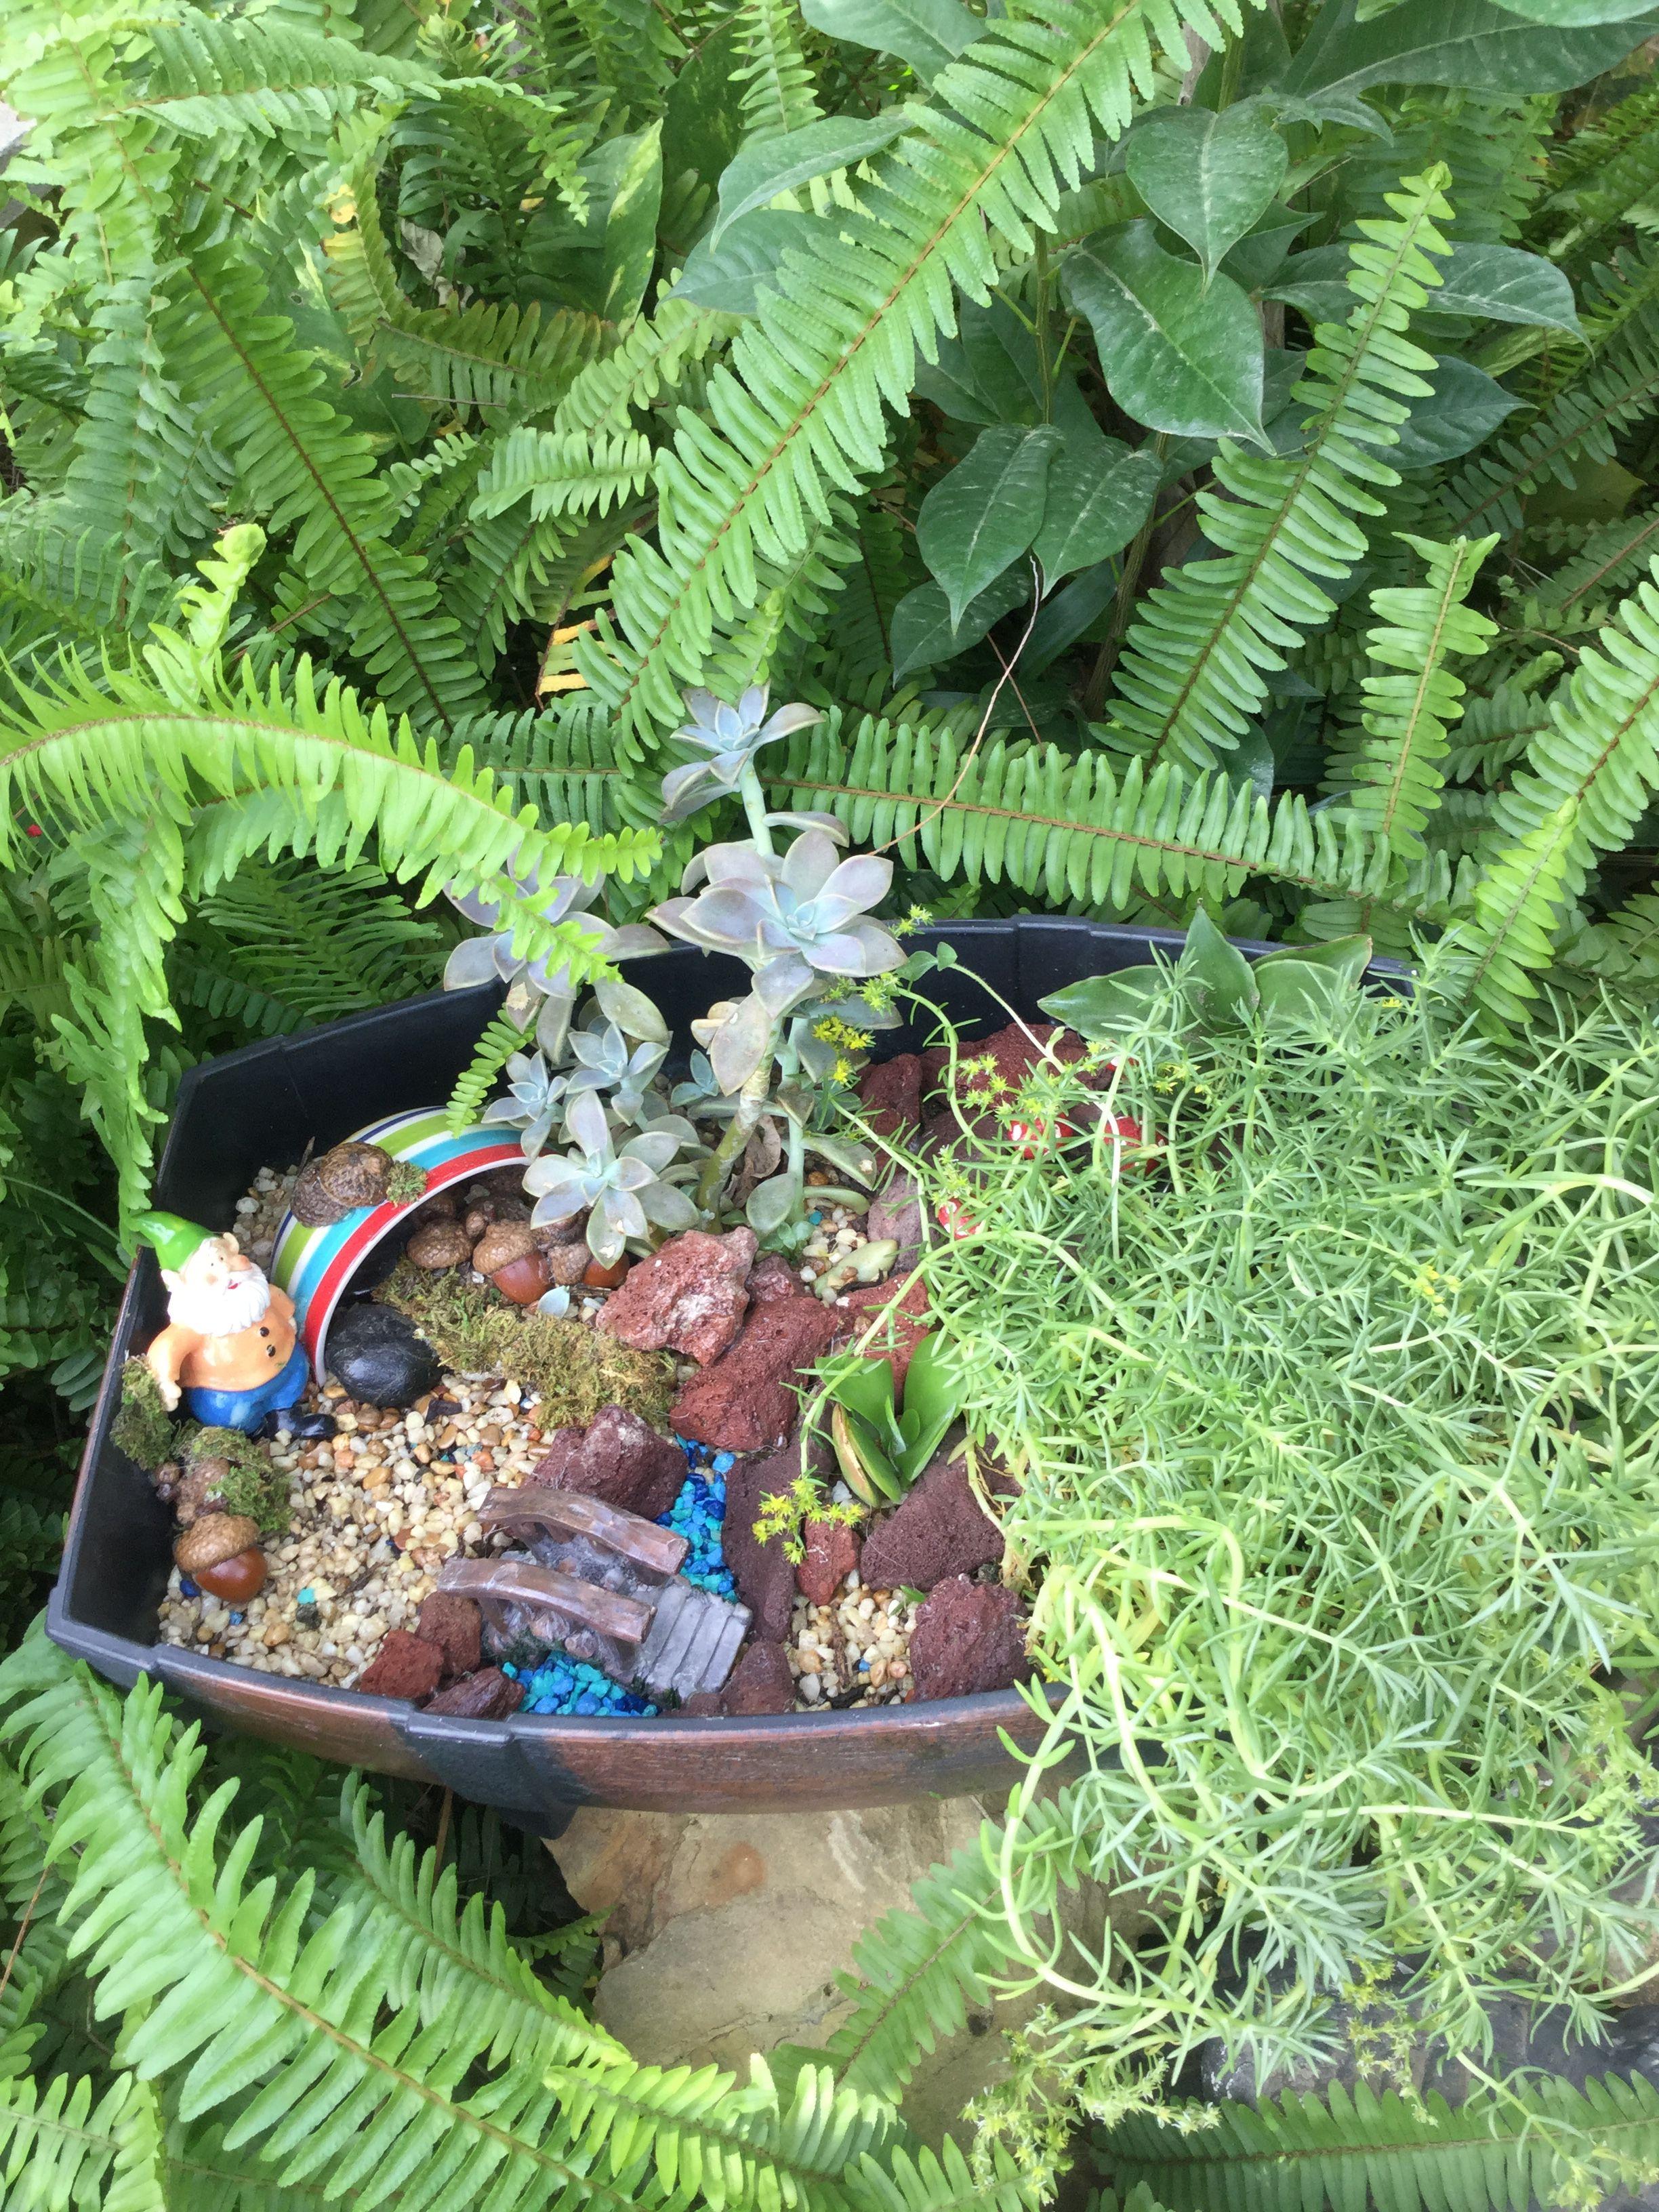 Garage Mini Fairy Gnome Fairies Mini Fairy Garden Garden Fee Du Logis Pin By Sandra Caldwell On Fairy Garden Pinterest Gardens Miniature Gnome Garden Ideas